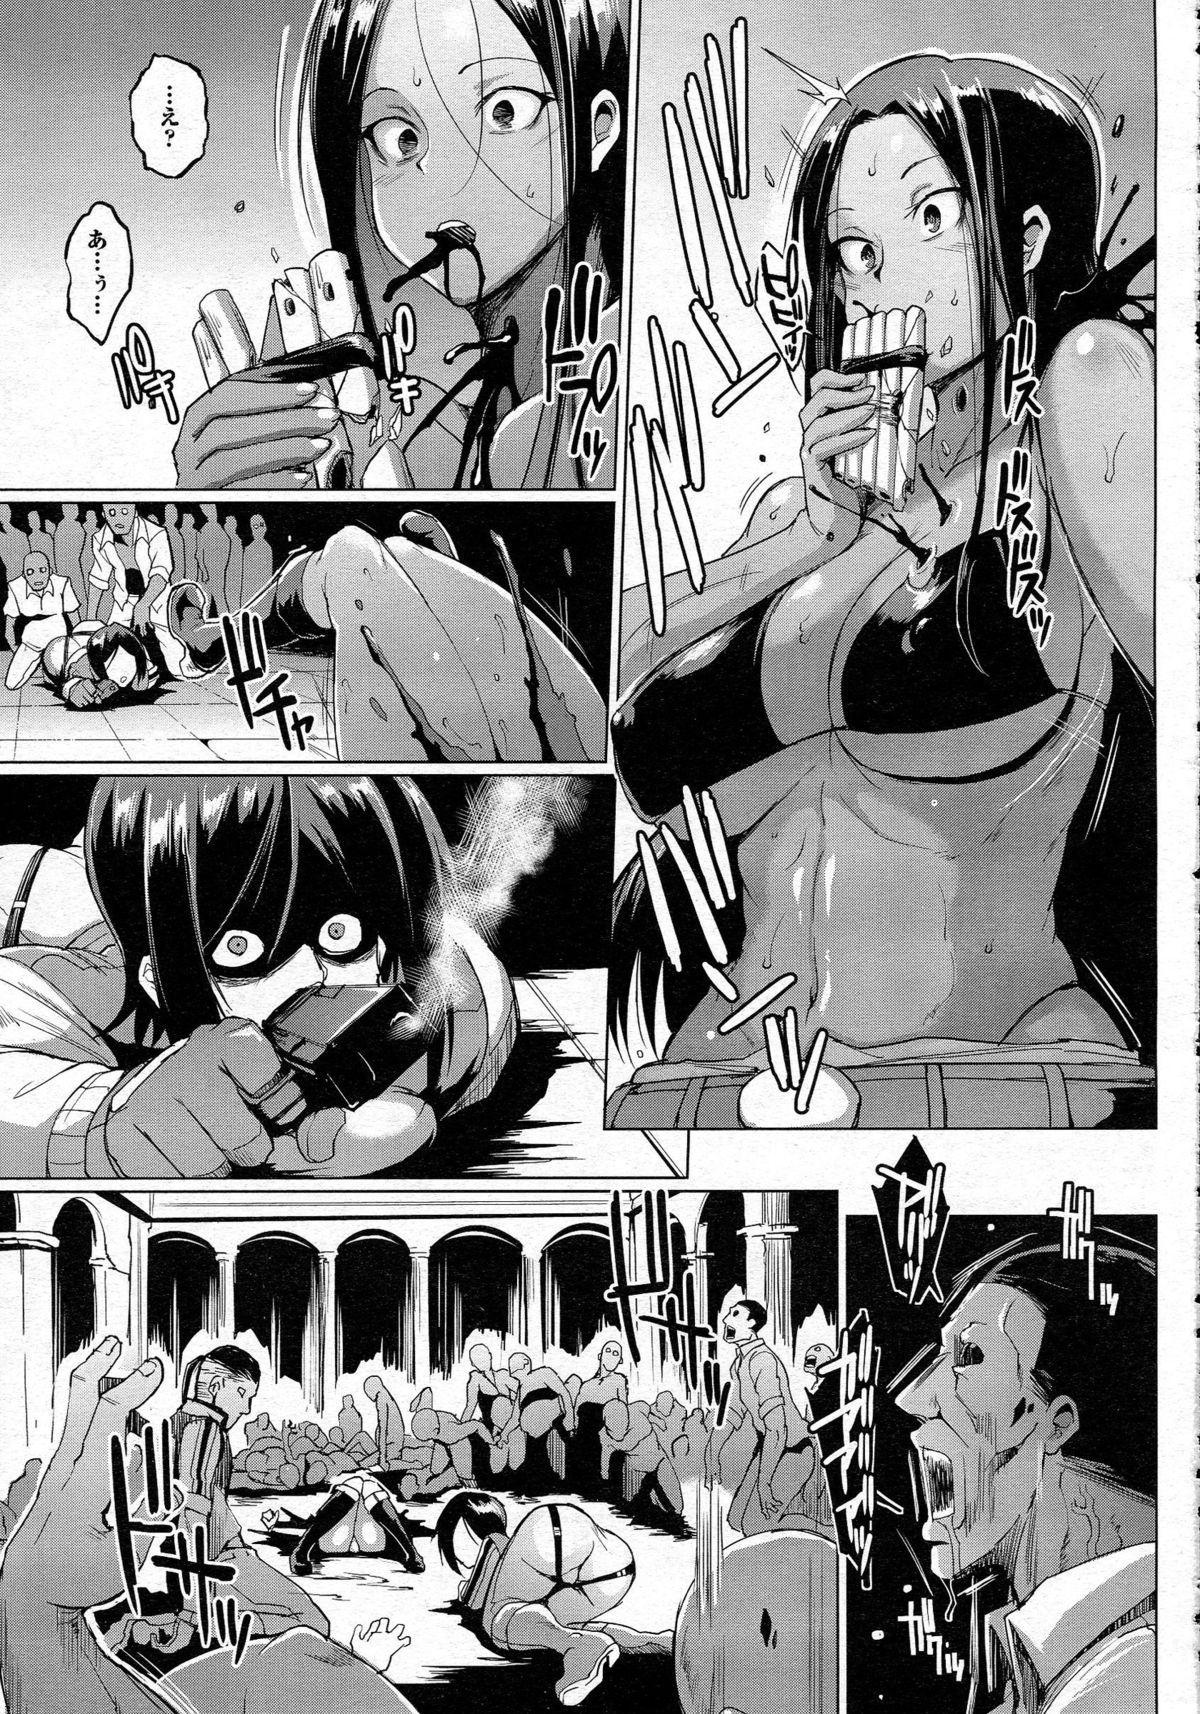 COMIC Unreal 2015-06 Vol. 55 + Hisasi Illust Shuu 99